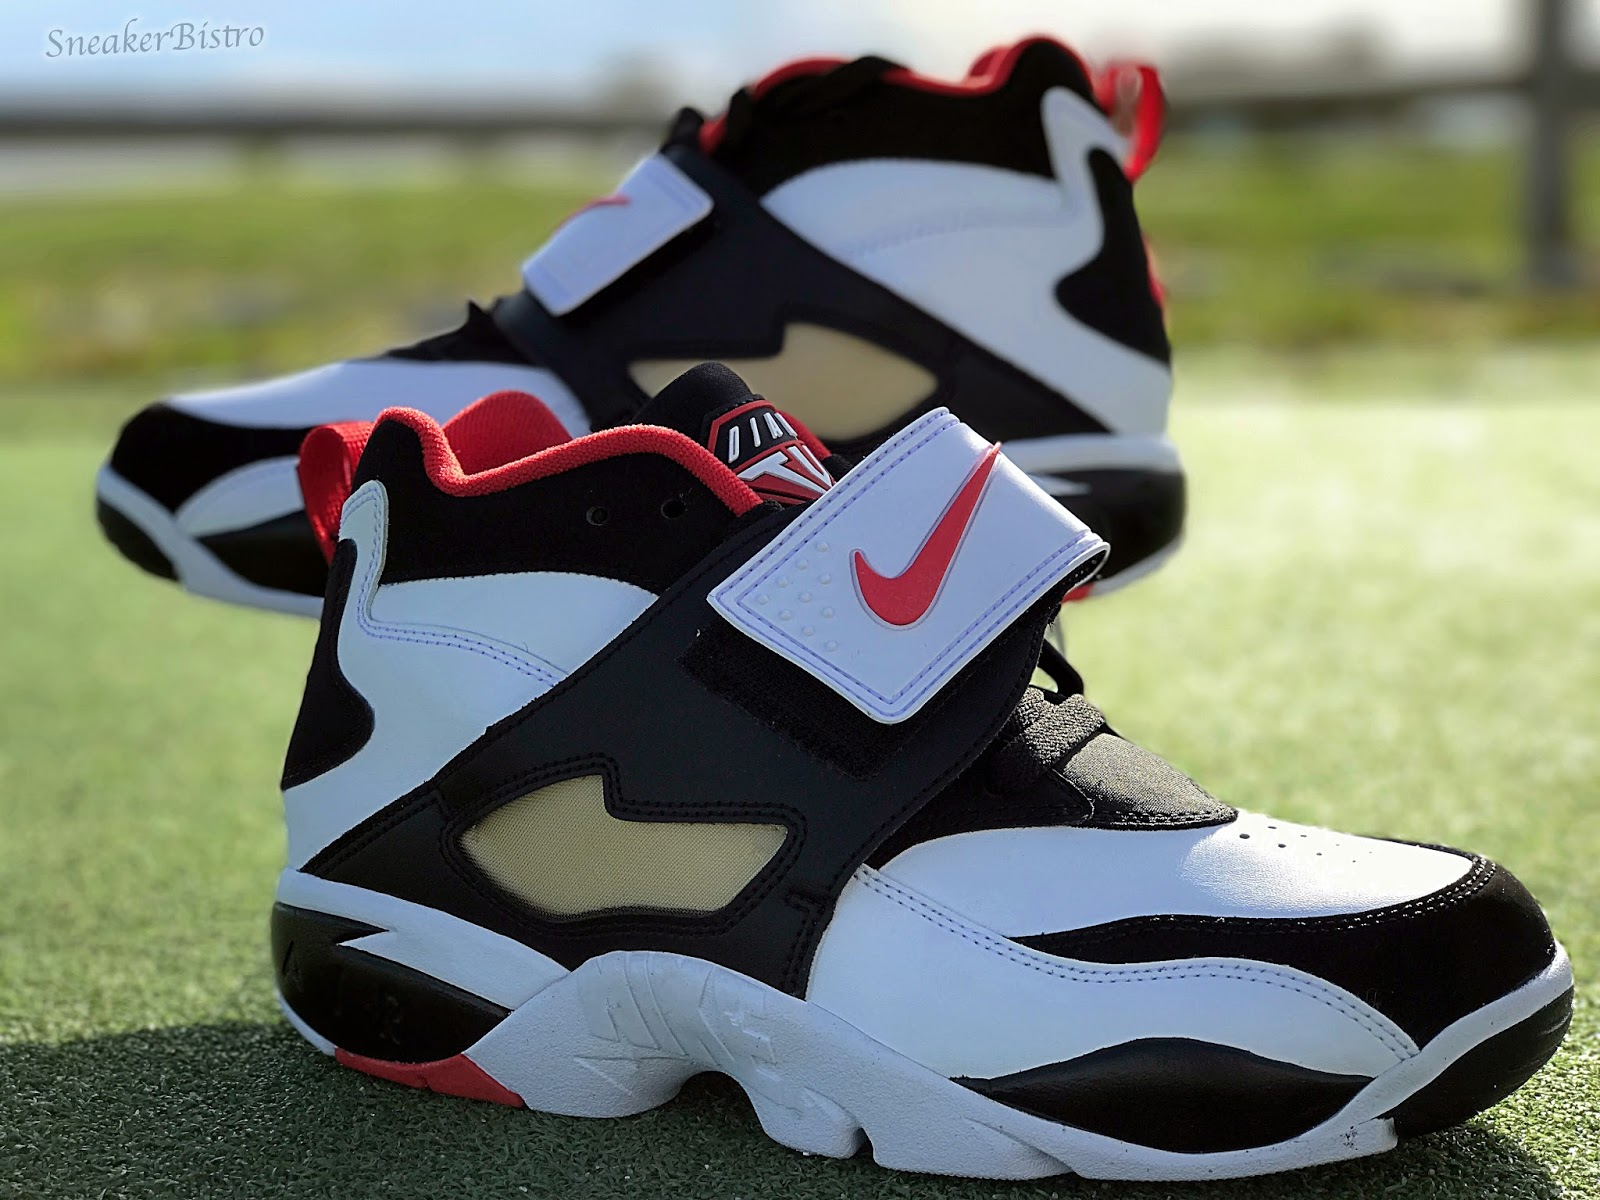 b104ed2b27 SNEAKER BISTRO - Streetwear Served w  Class: Nike Air Diamond Turf ...